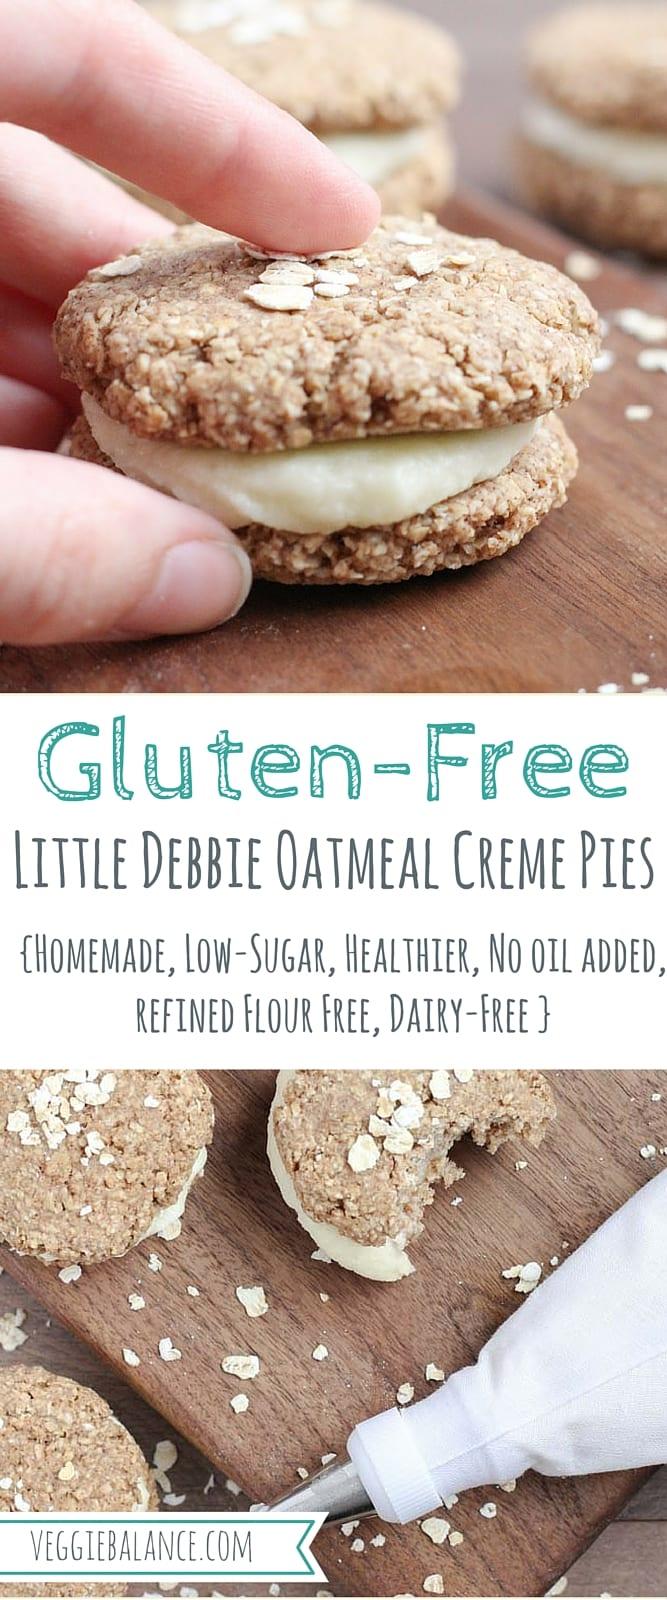 Gluten-Free Little Debbie Oatmeal Creme Pies {Low-Sugar} - Veggiebalance.com